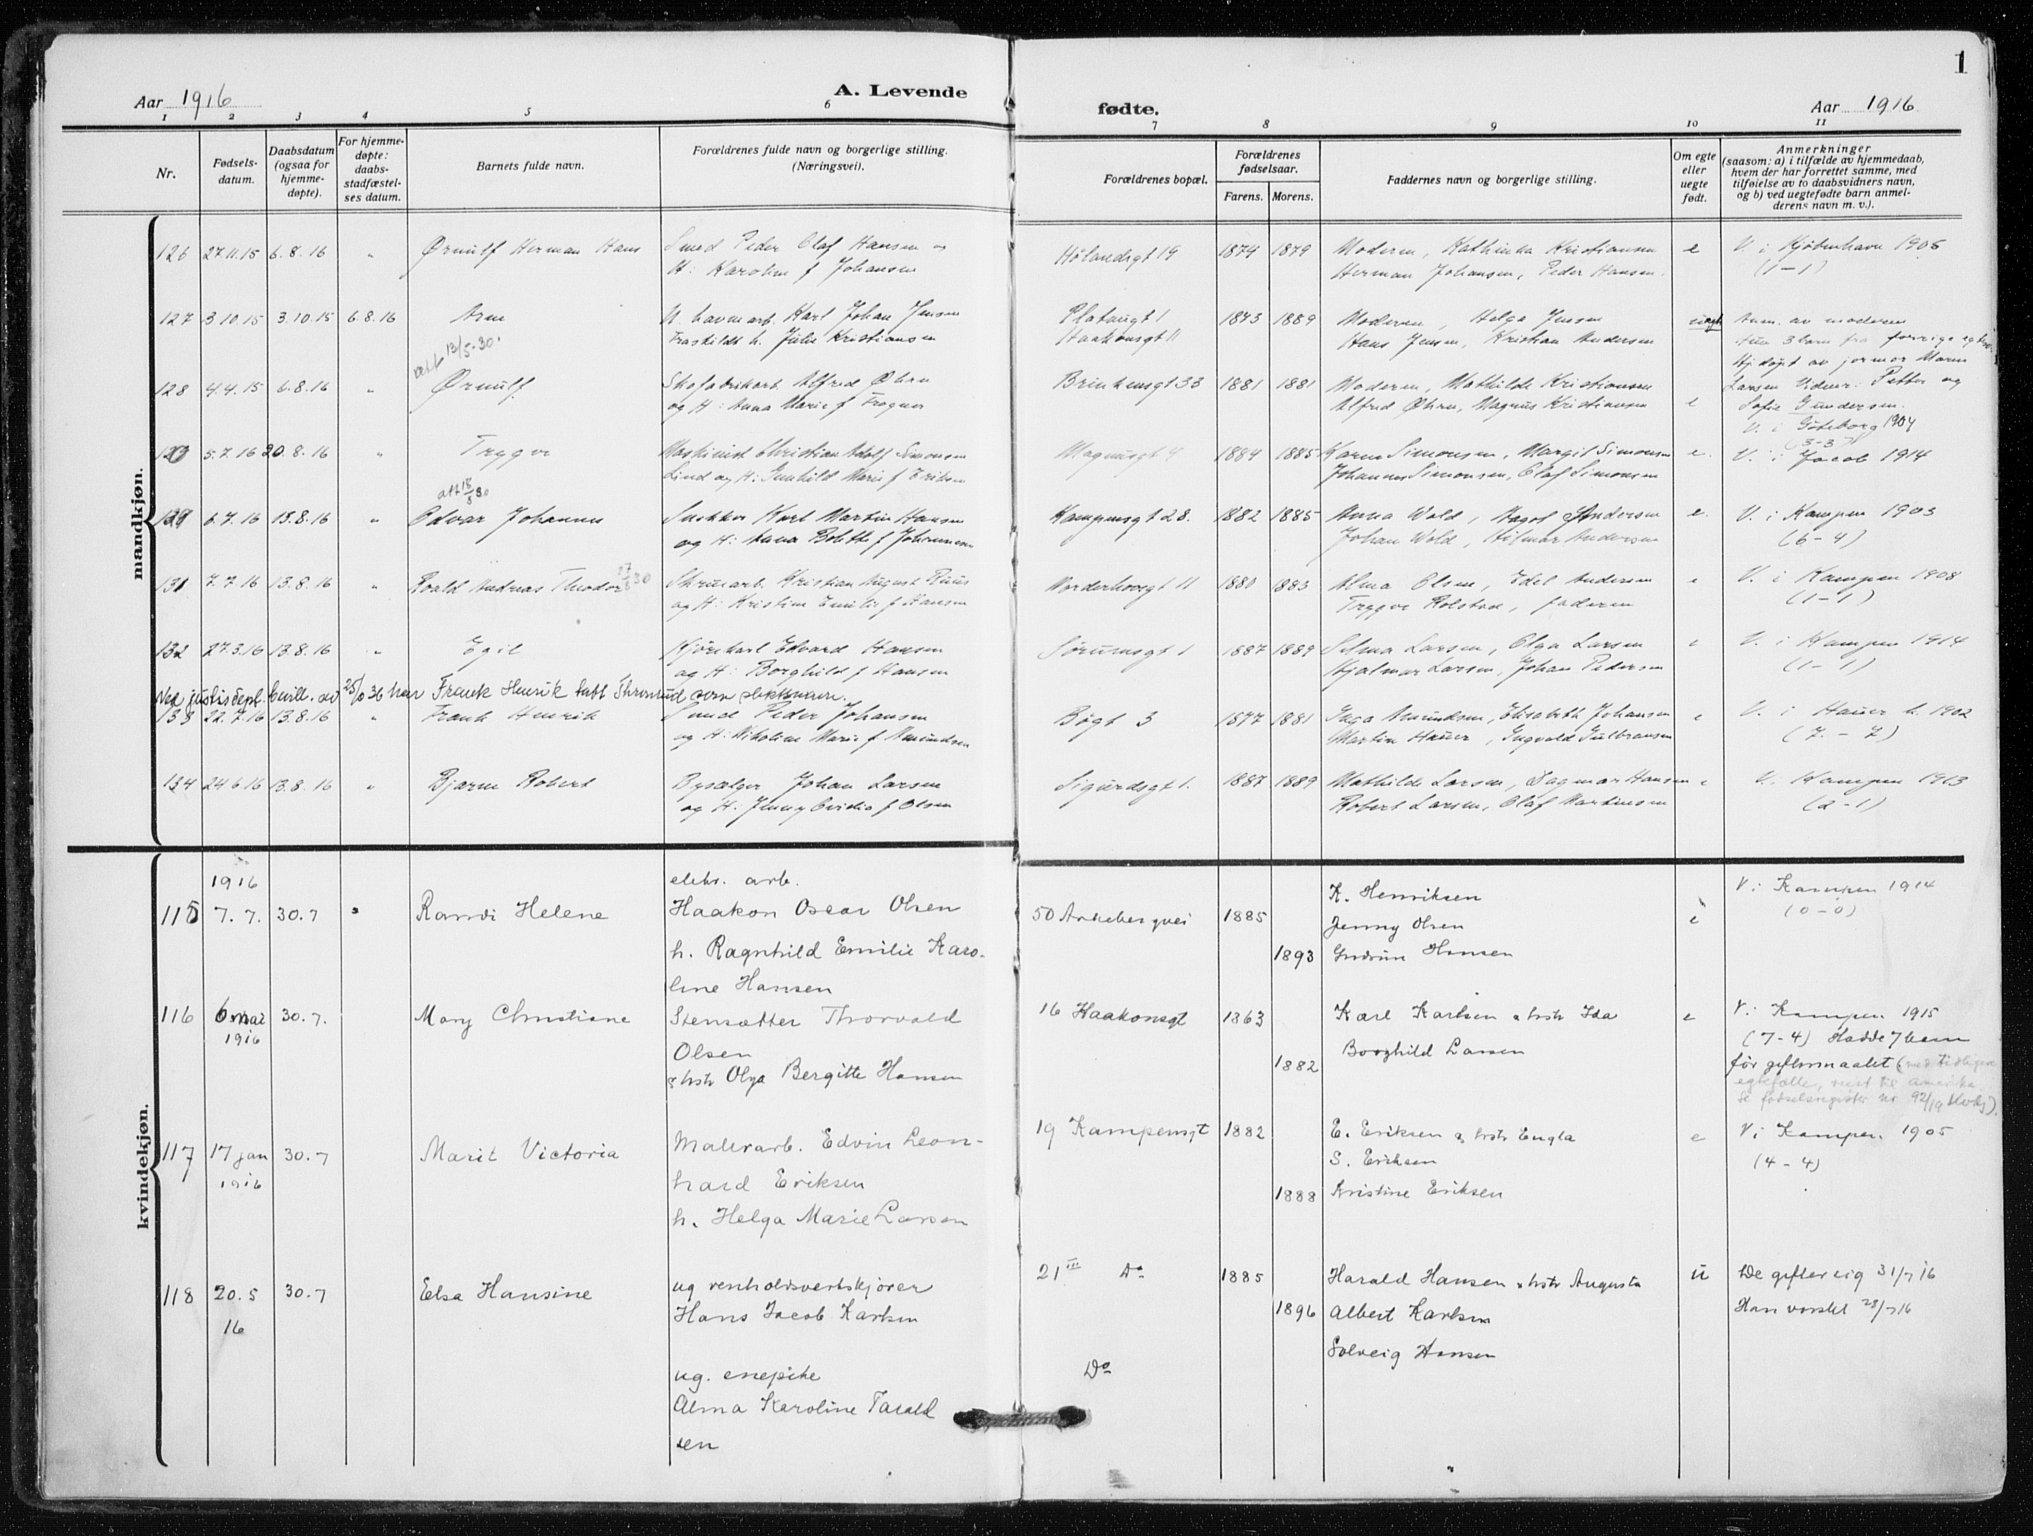 SAO, Kampen prestekontor Kirkebøker, F/Fa/L0012: Ministerialbok nr. I 12, 1916-1921, s. 1